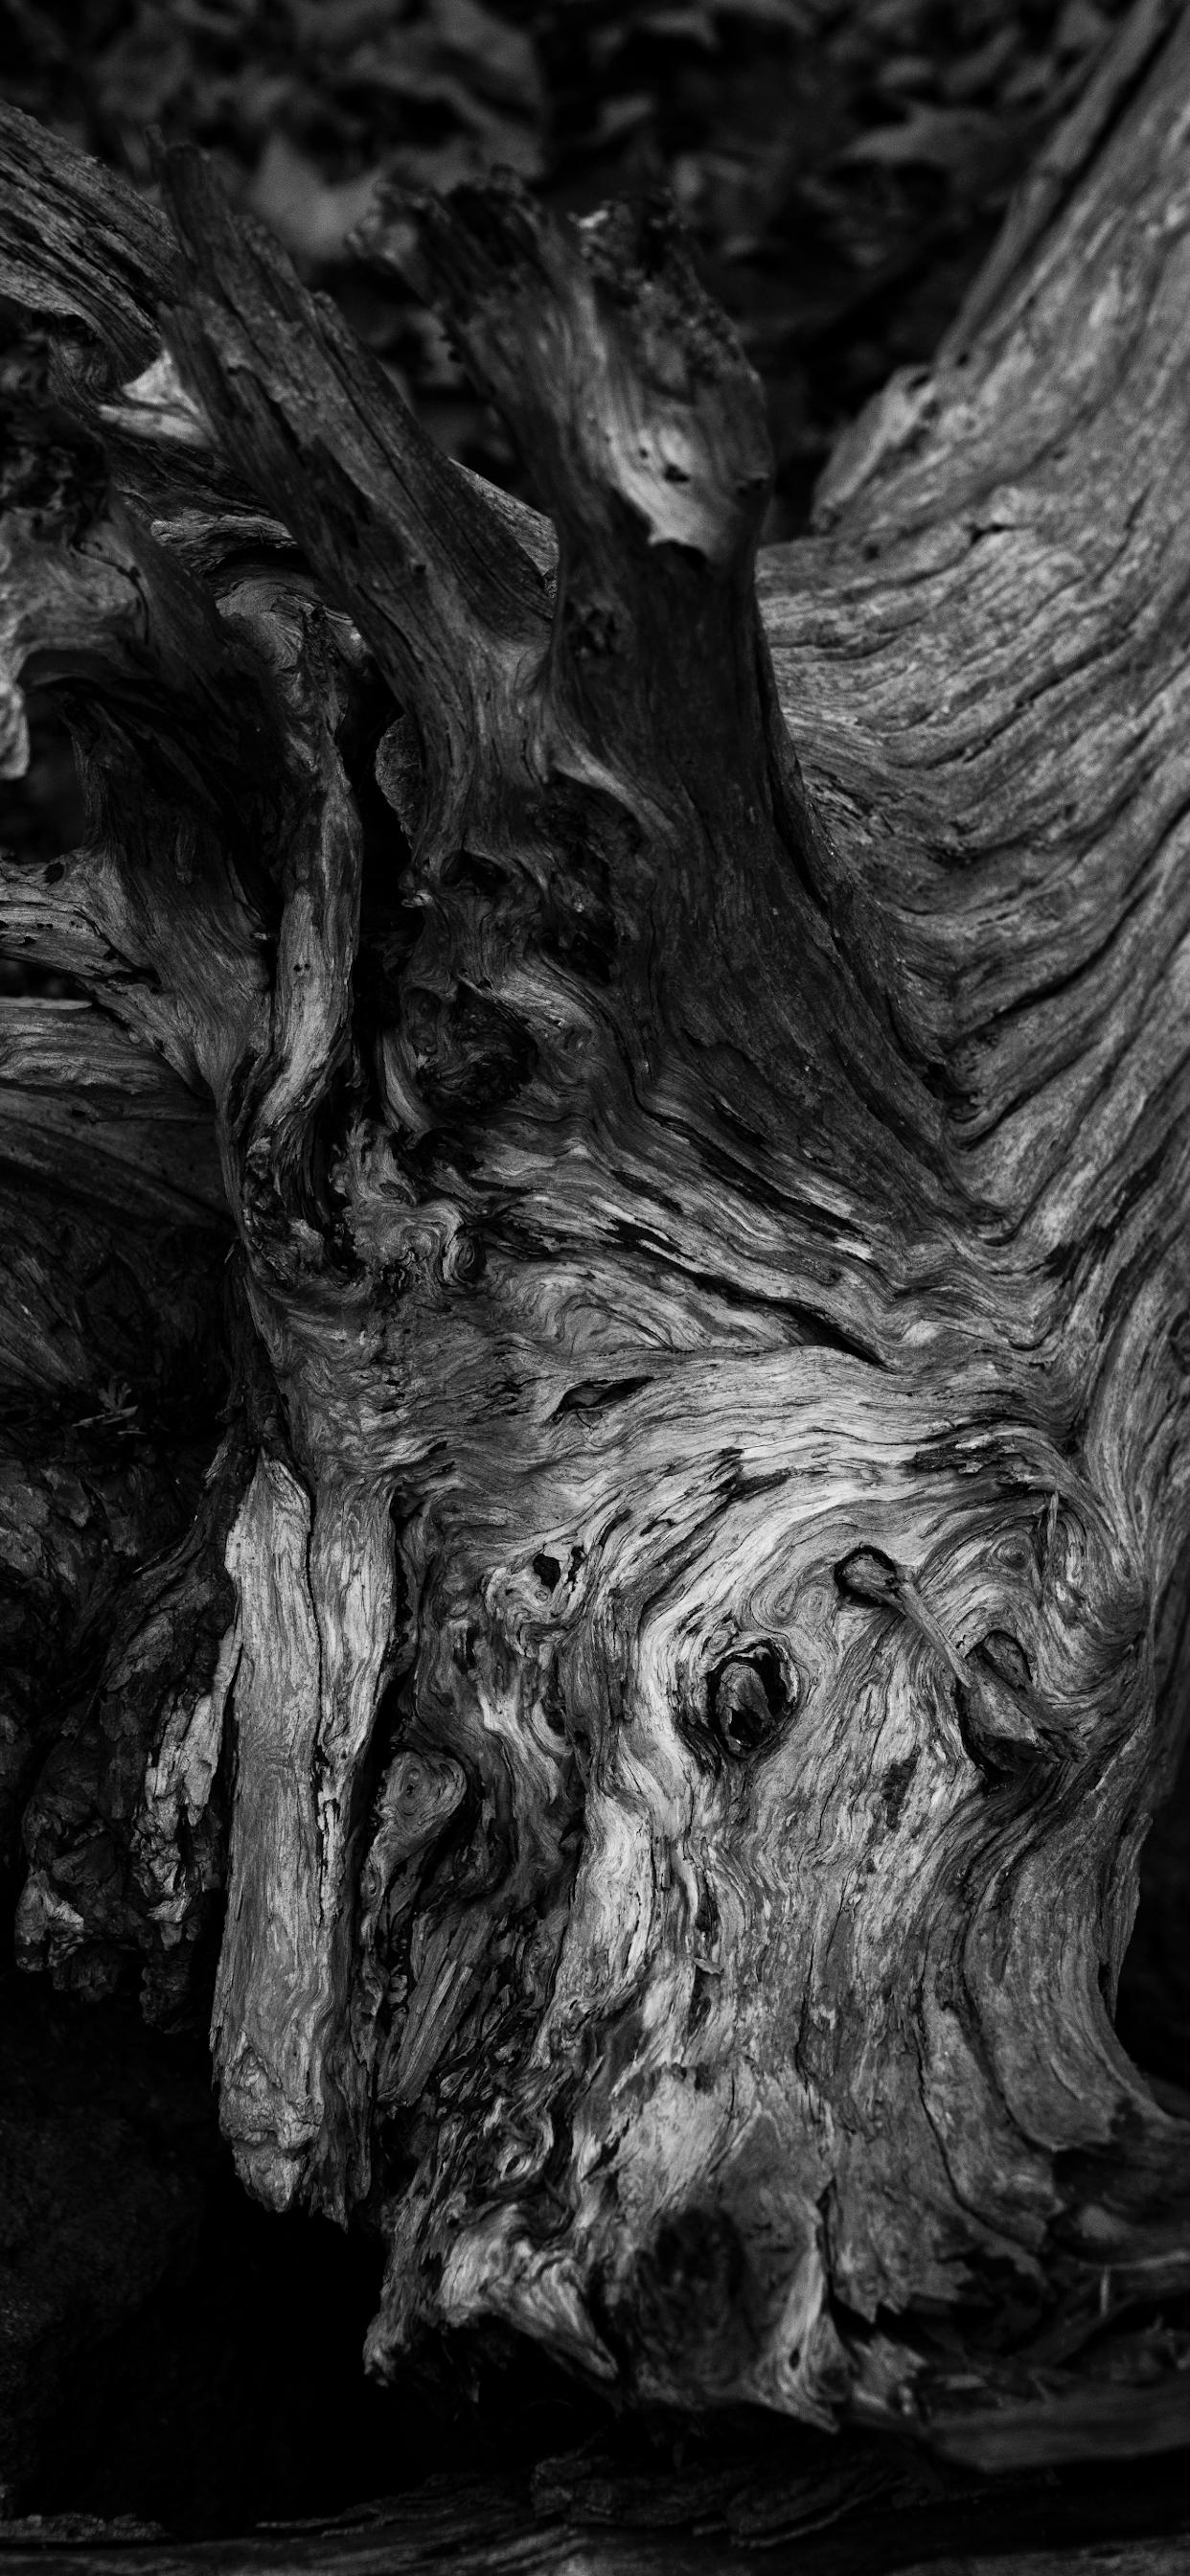 iPhone wallpapers textures tree rattlesnake Textures